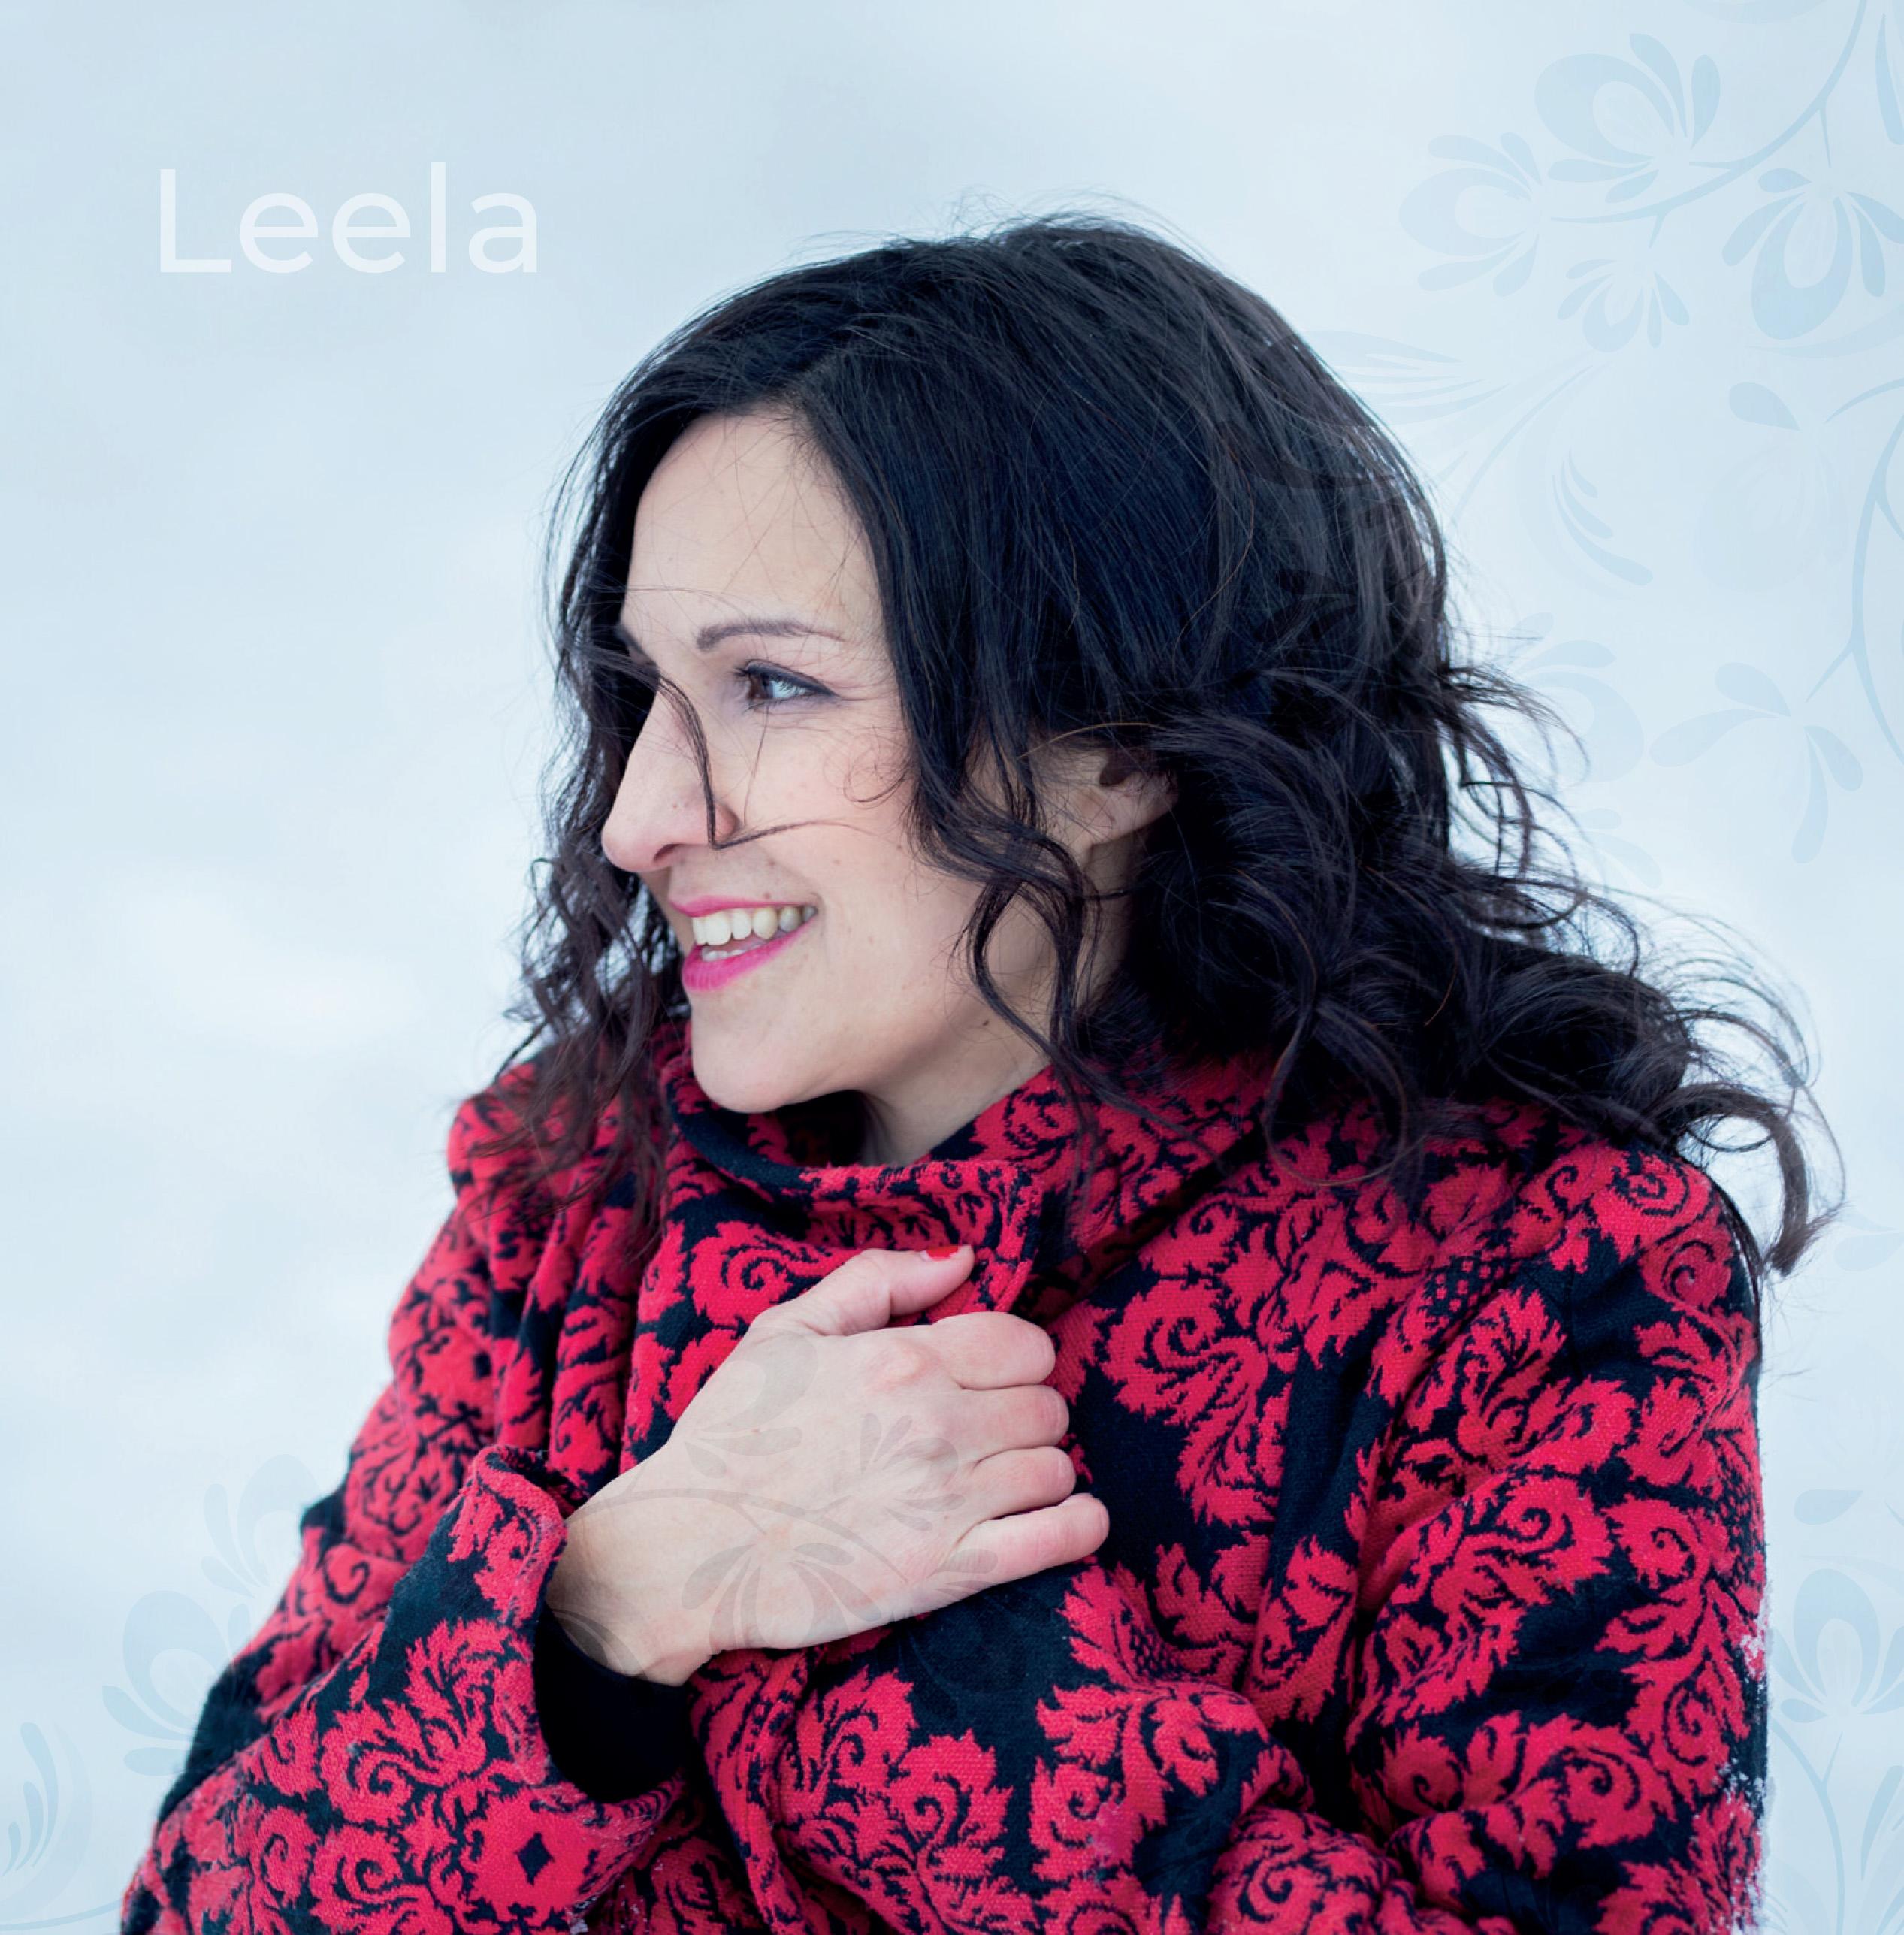 Leela chanson